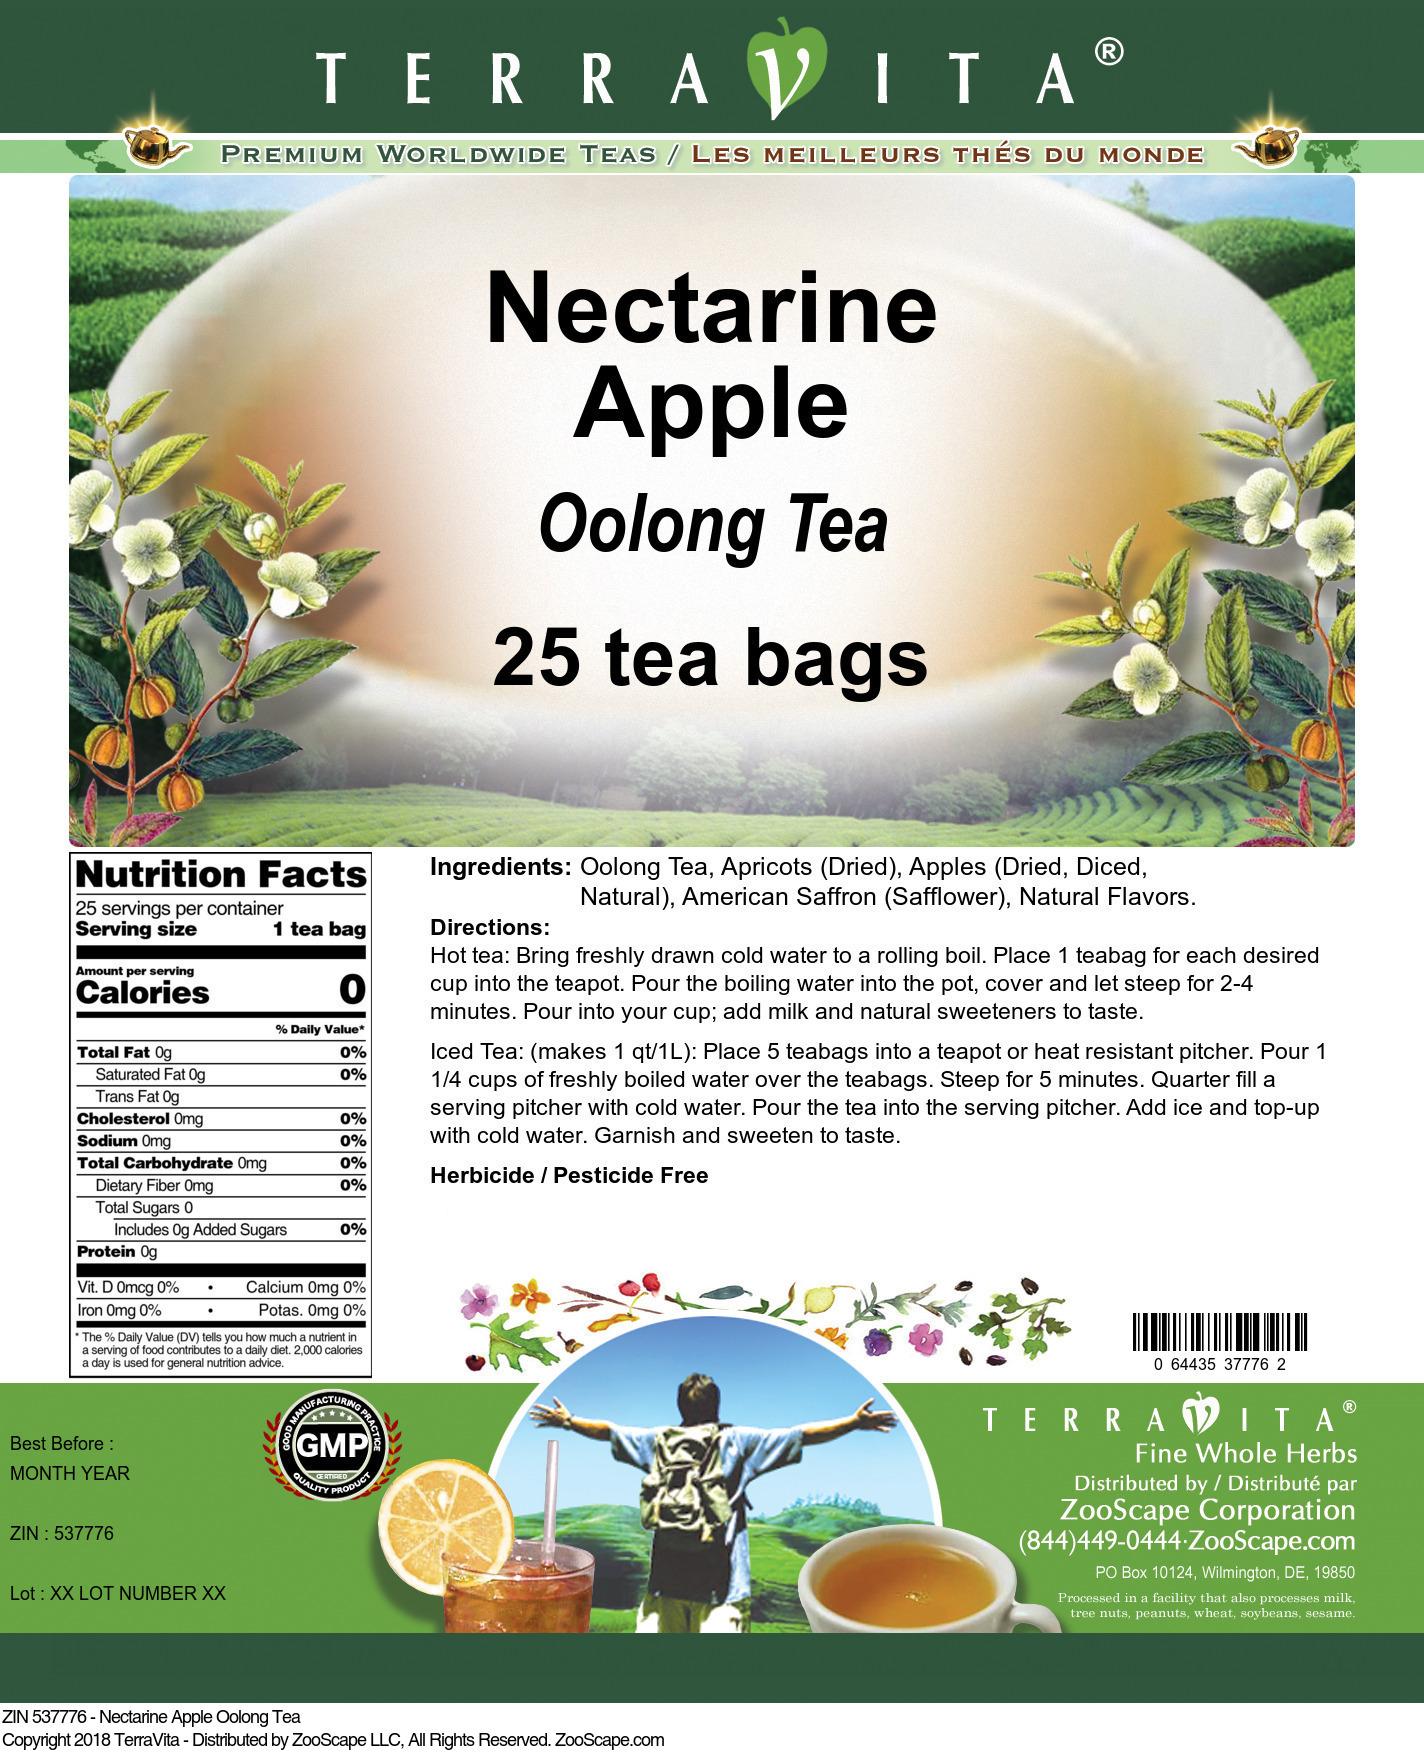 Nectarine Apple Oolong Tea